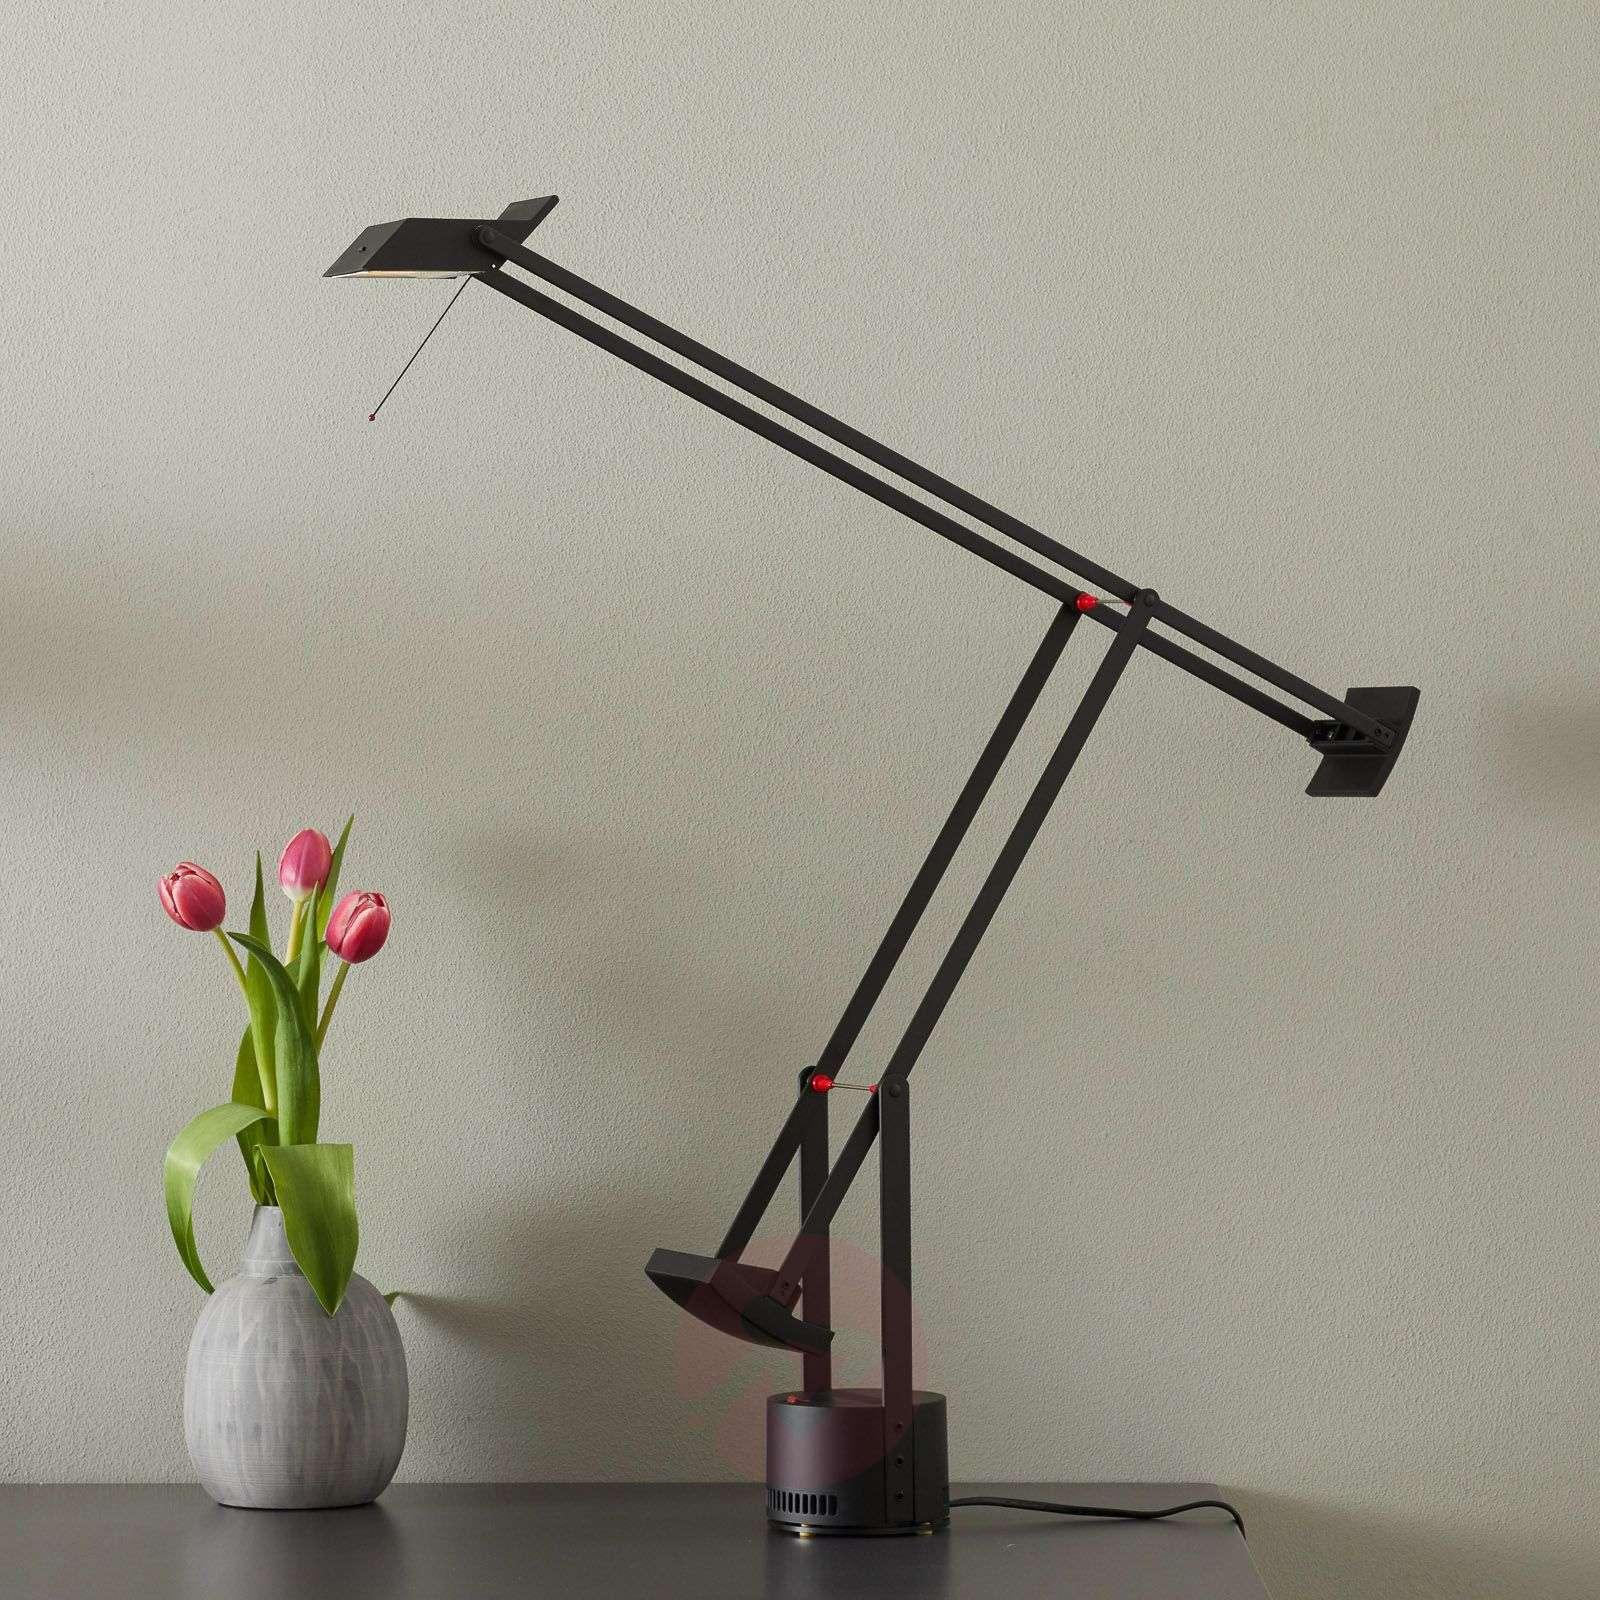 Tizio innovative designer table light-1060058-01